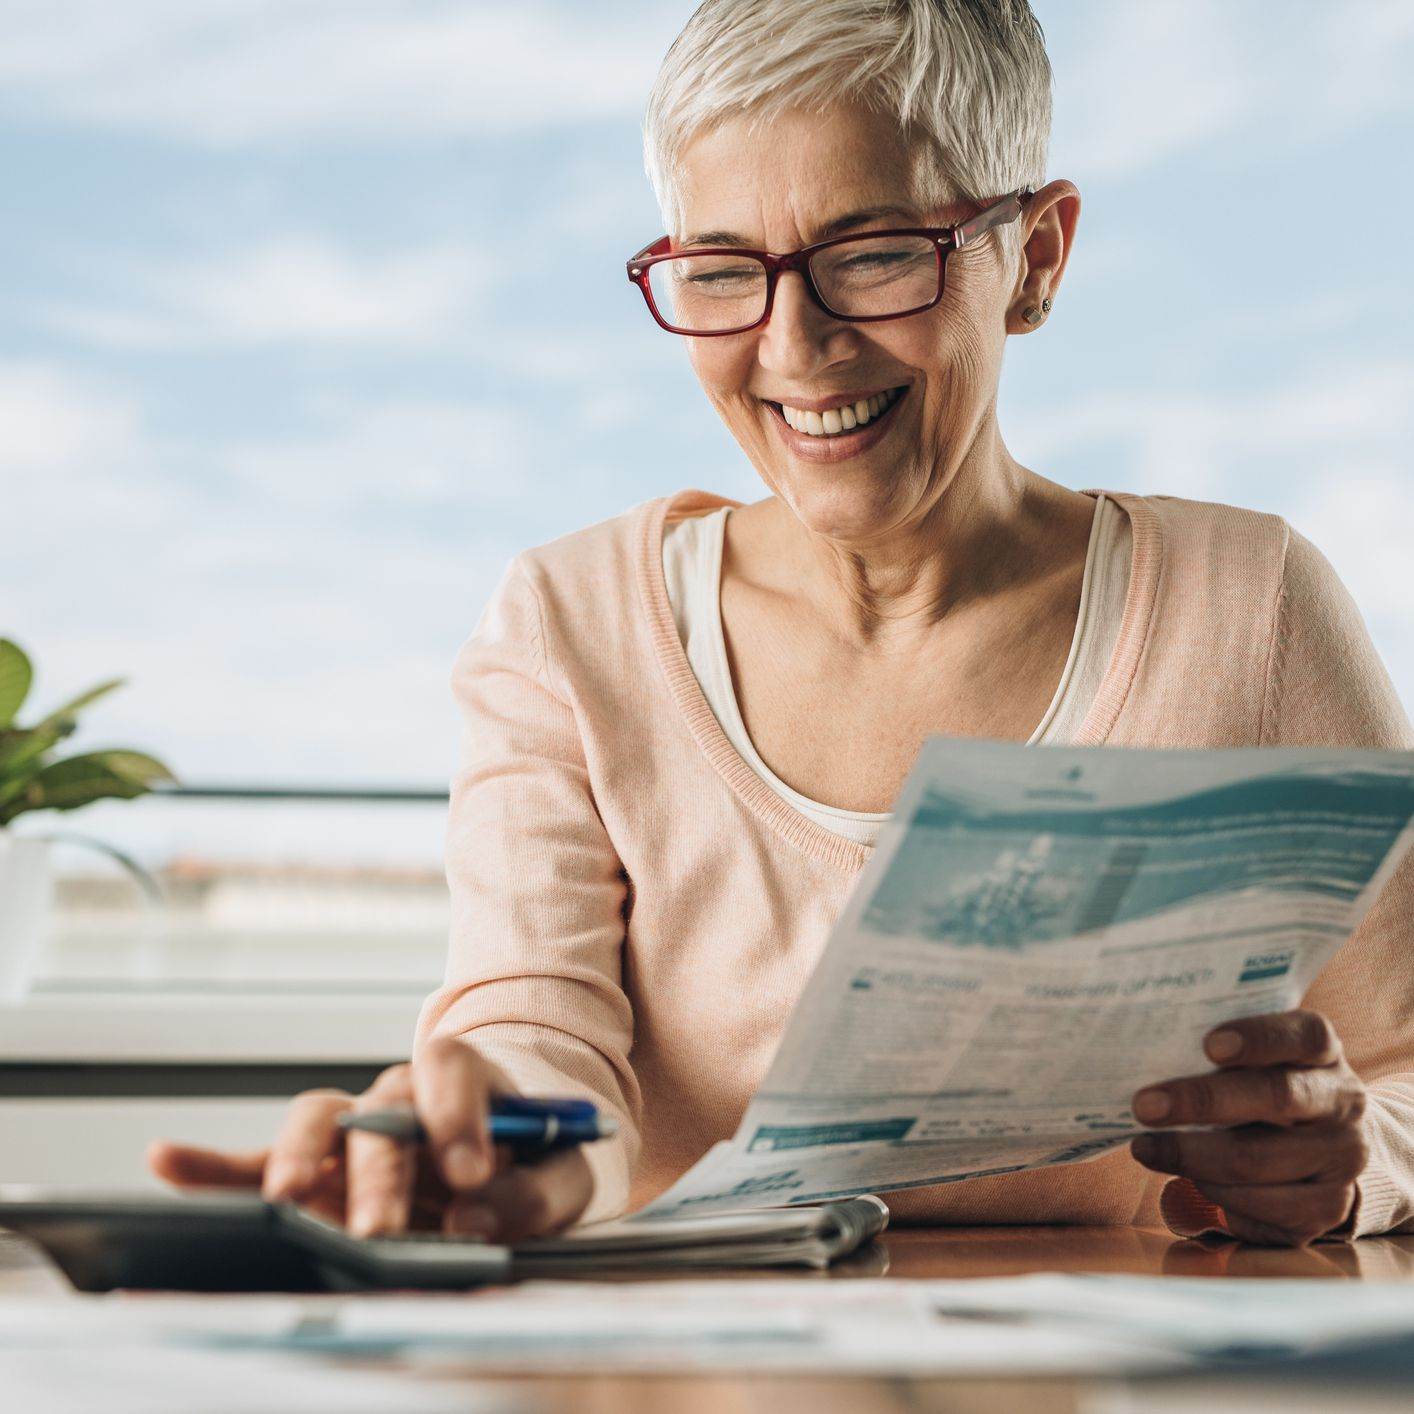 60 Best Discounts for Seniors